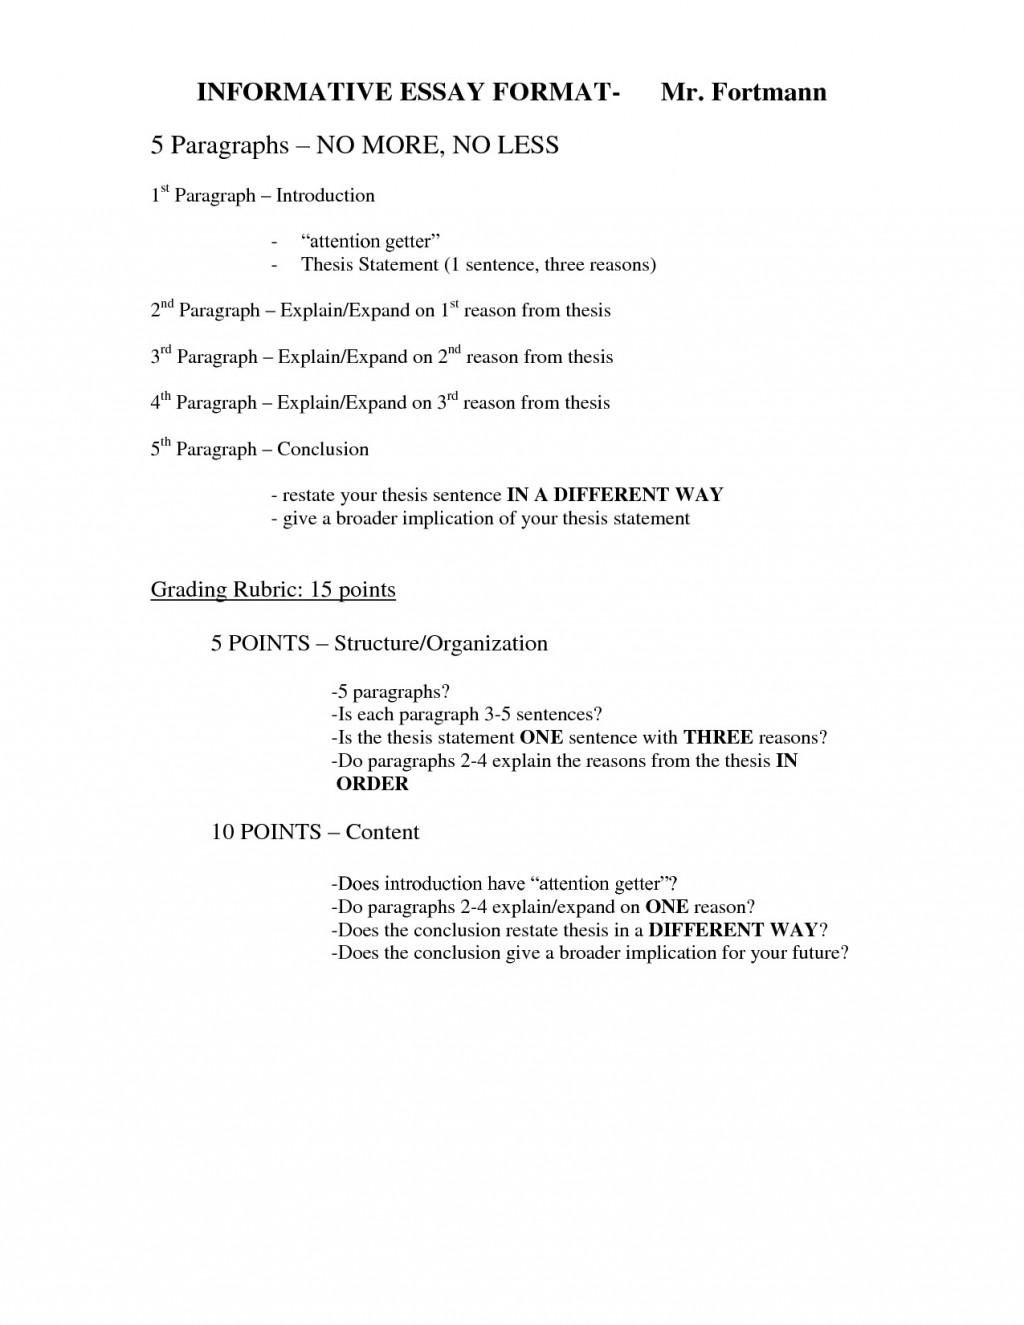 020 Essay Example Argumentative Structure Writing Good Hooks Worksheetve Informative Essays Paragraph Outline Imposing Ppt Pdf Worksheet Large